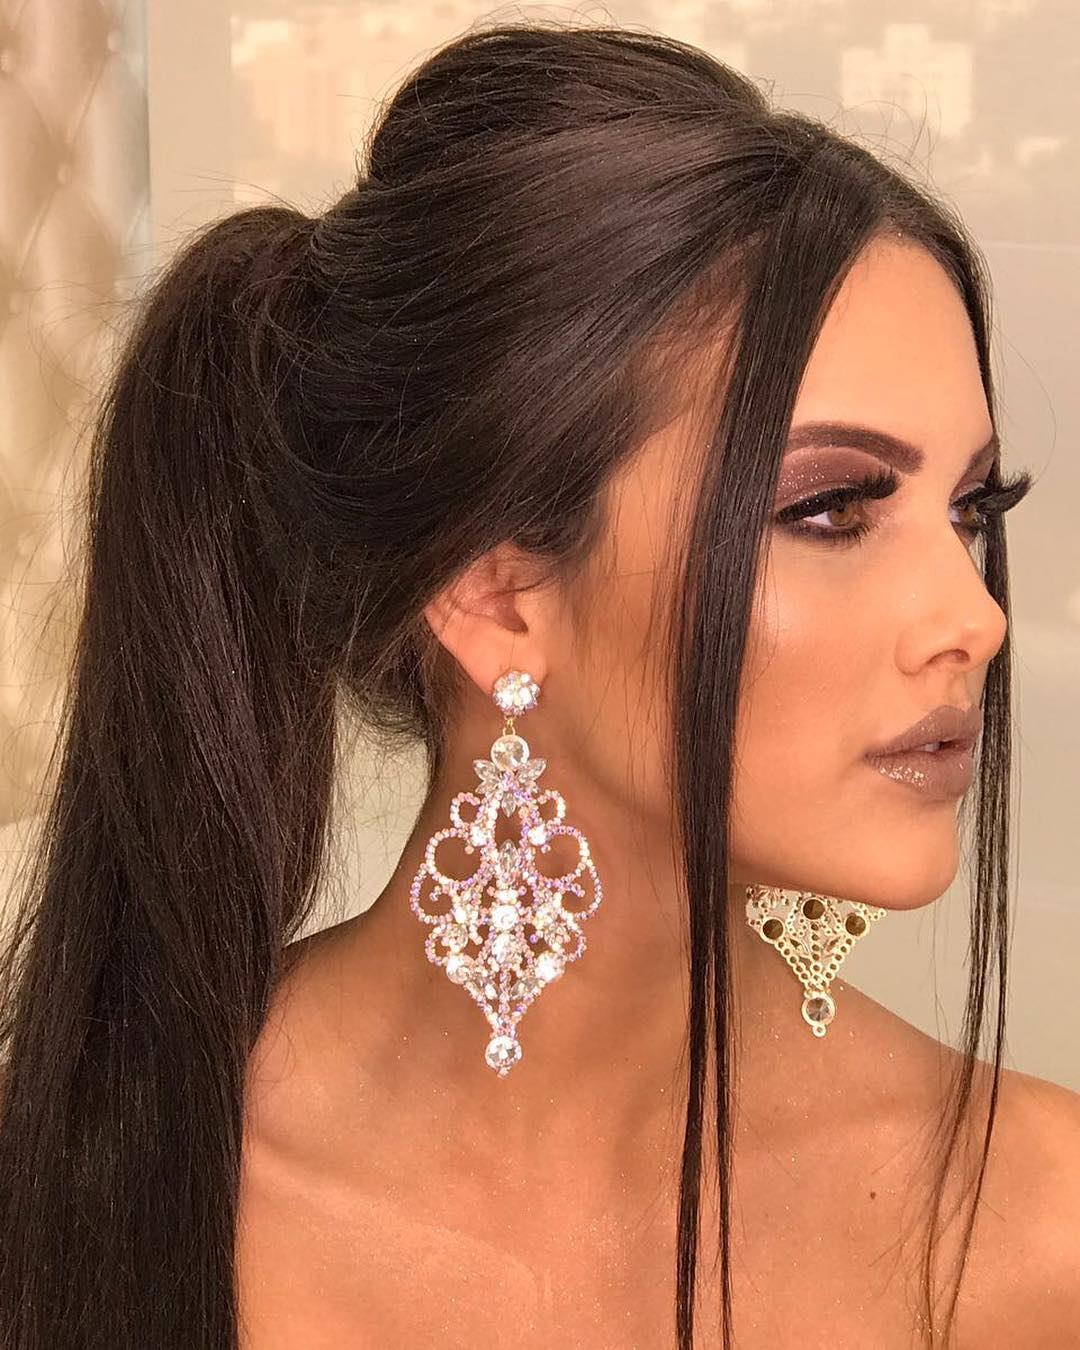 emily garcia, miss teen earth international 2017. Eewjziva